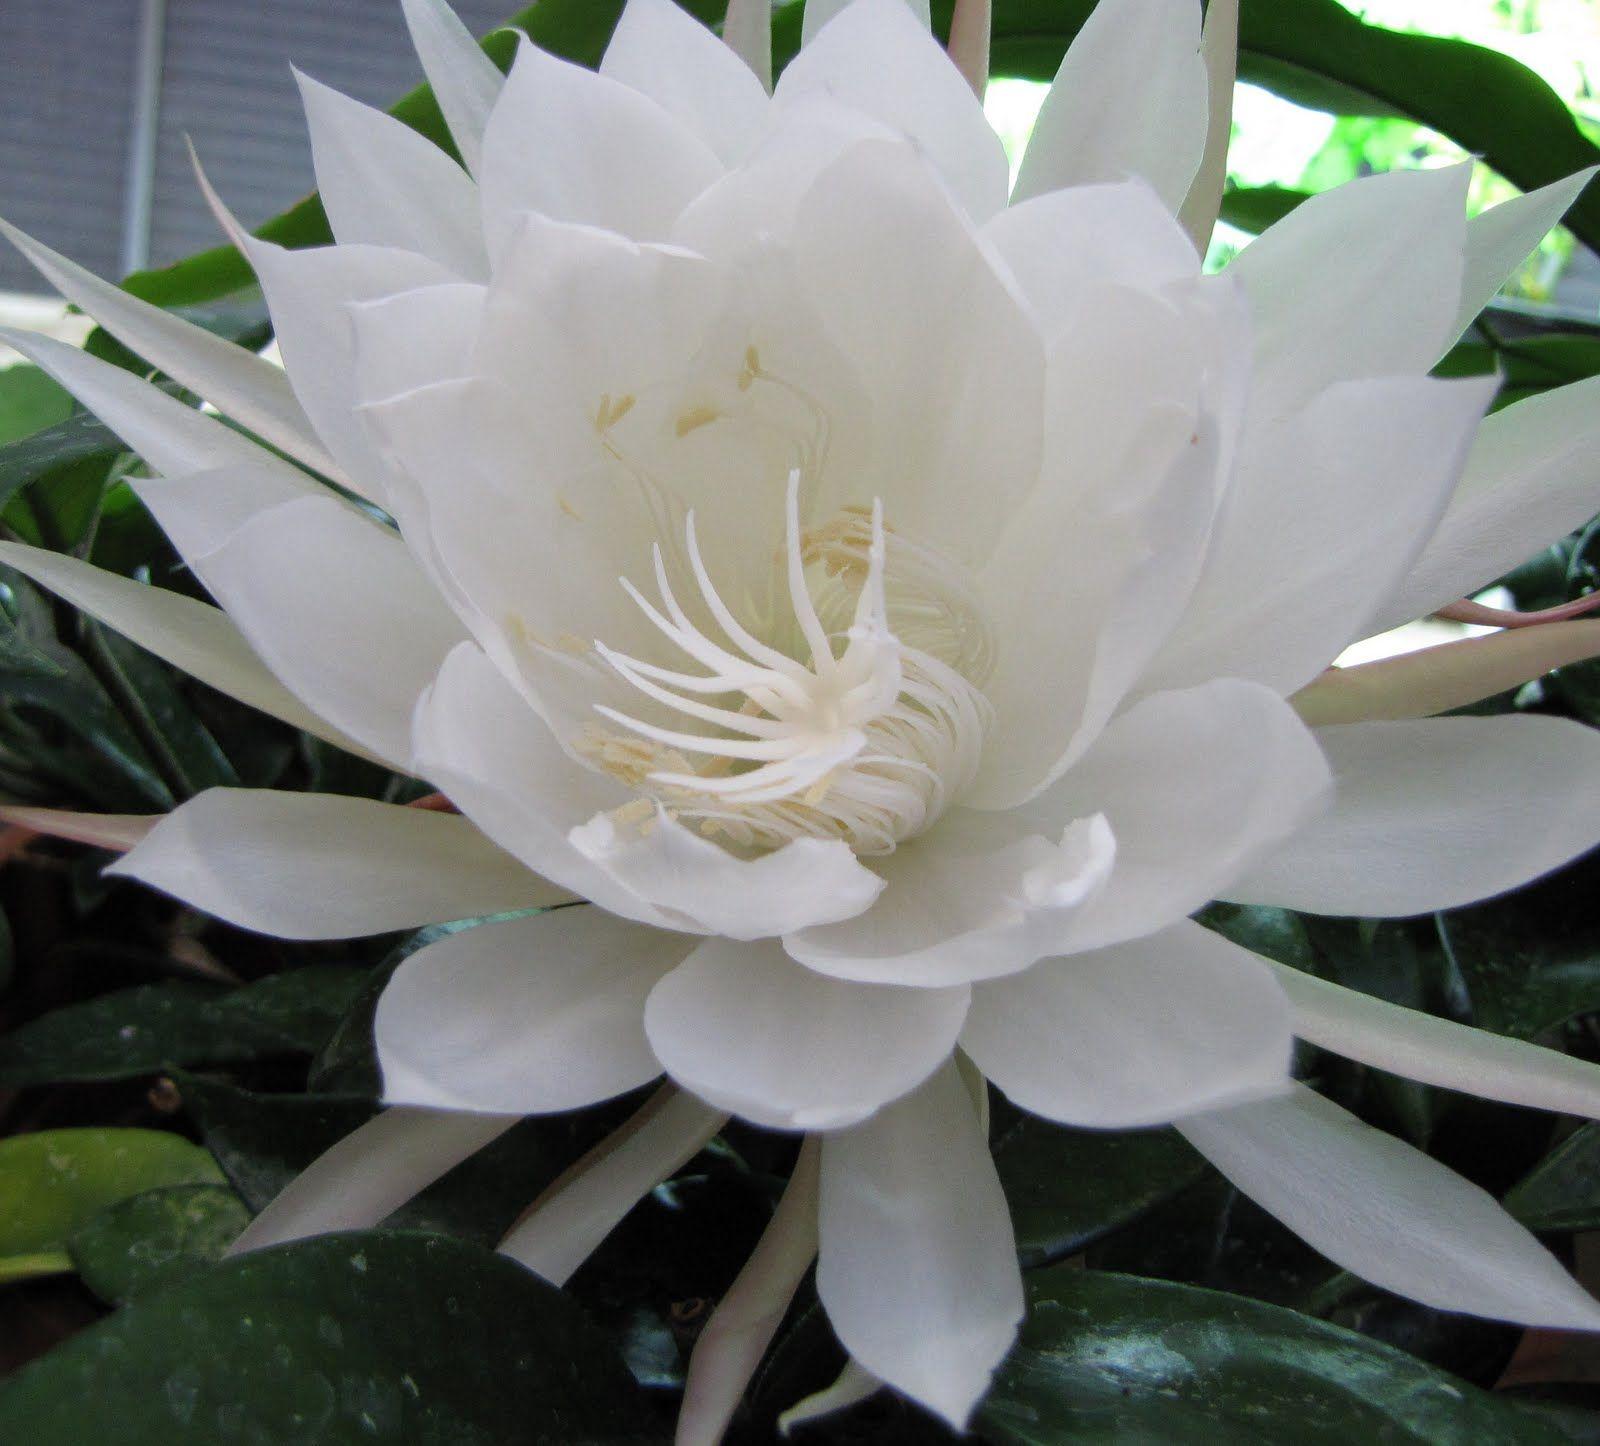 Flowers unique flowers beautiful flowers orchid cactus cactus flower - The Biggest Plant Dictionary Epiphyllum Oxypetalum